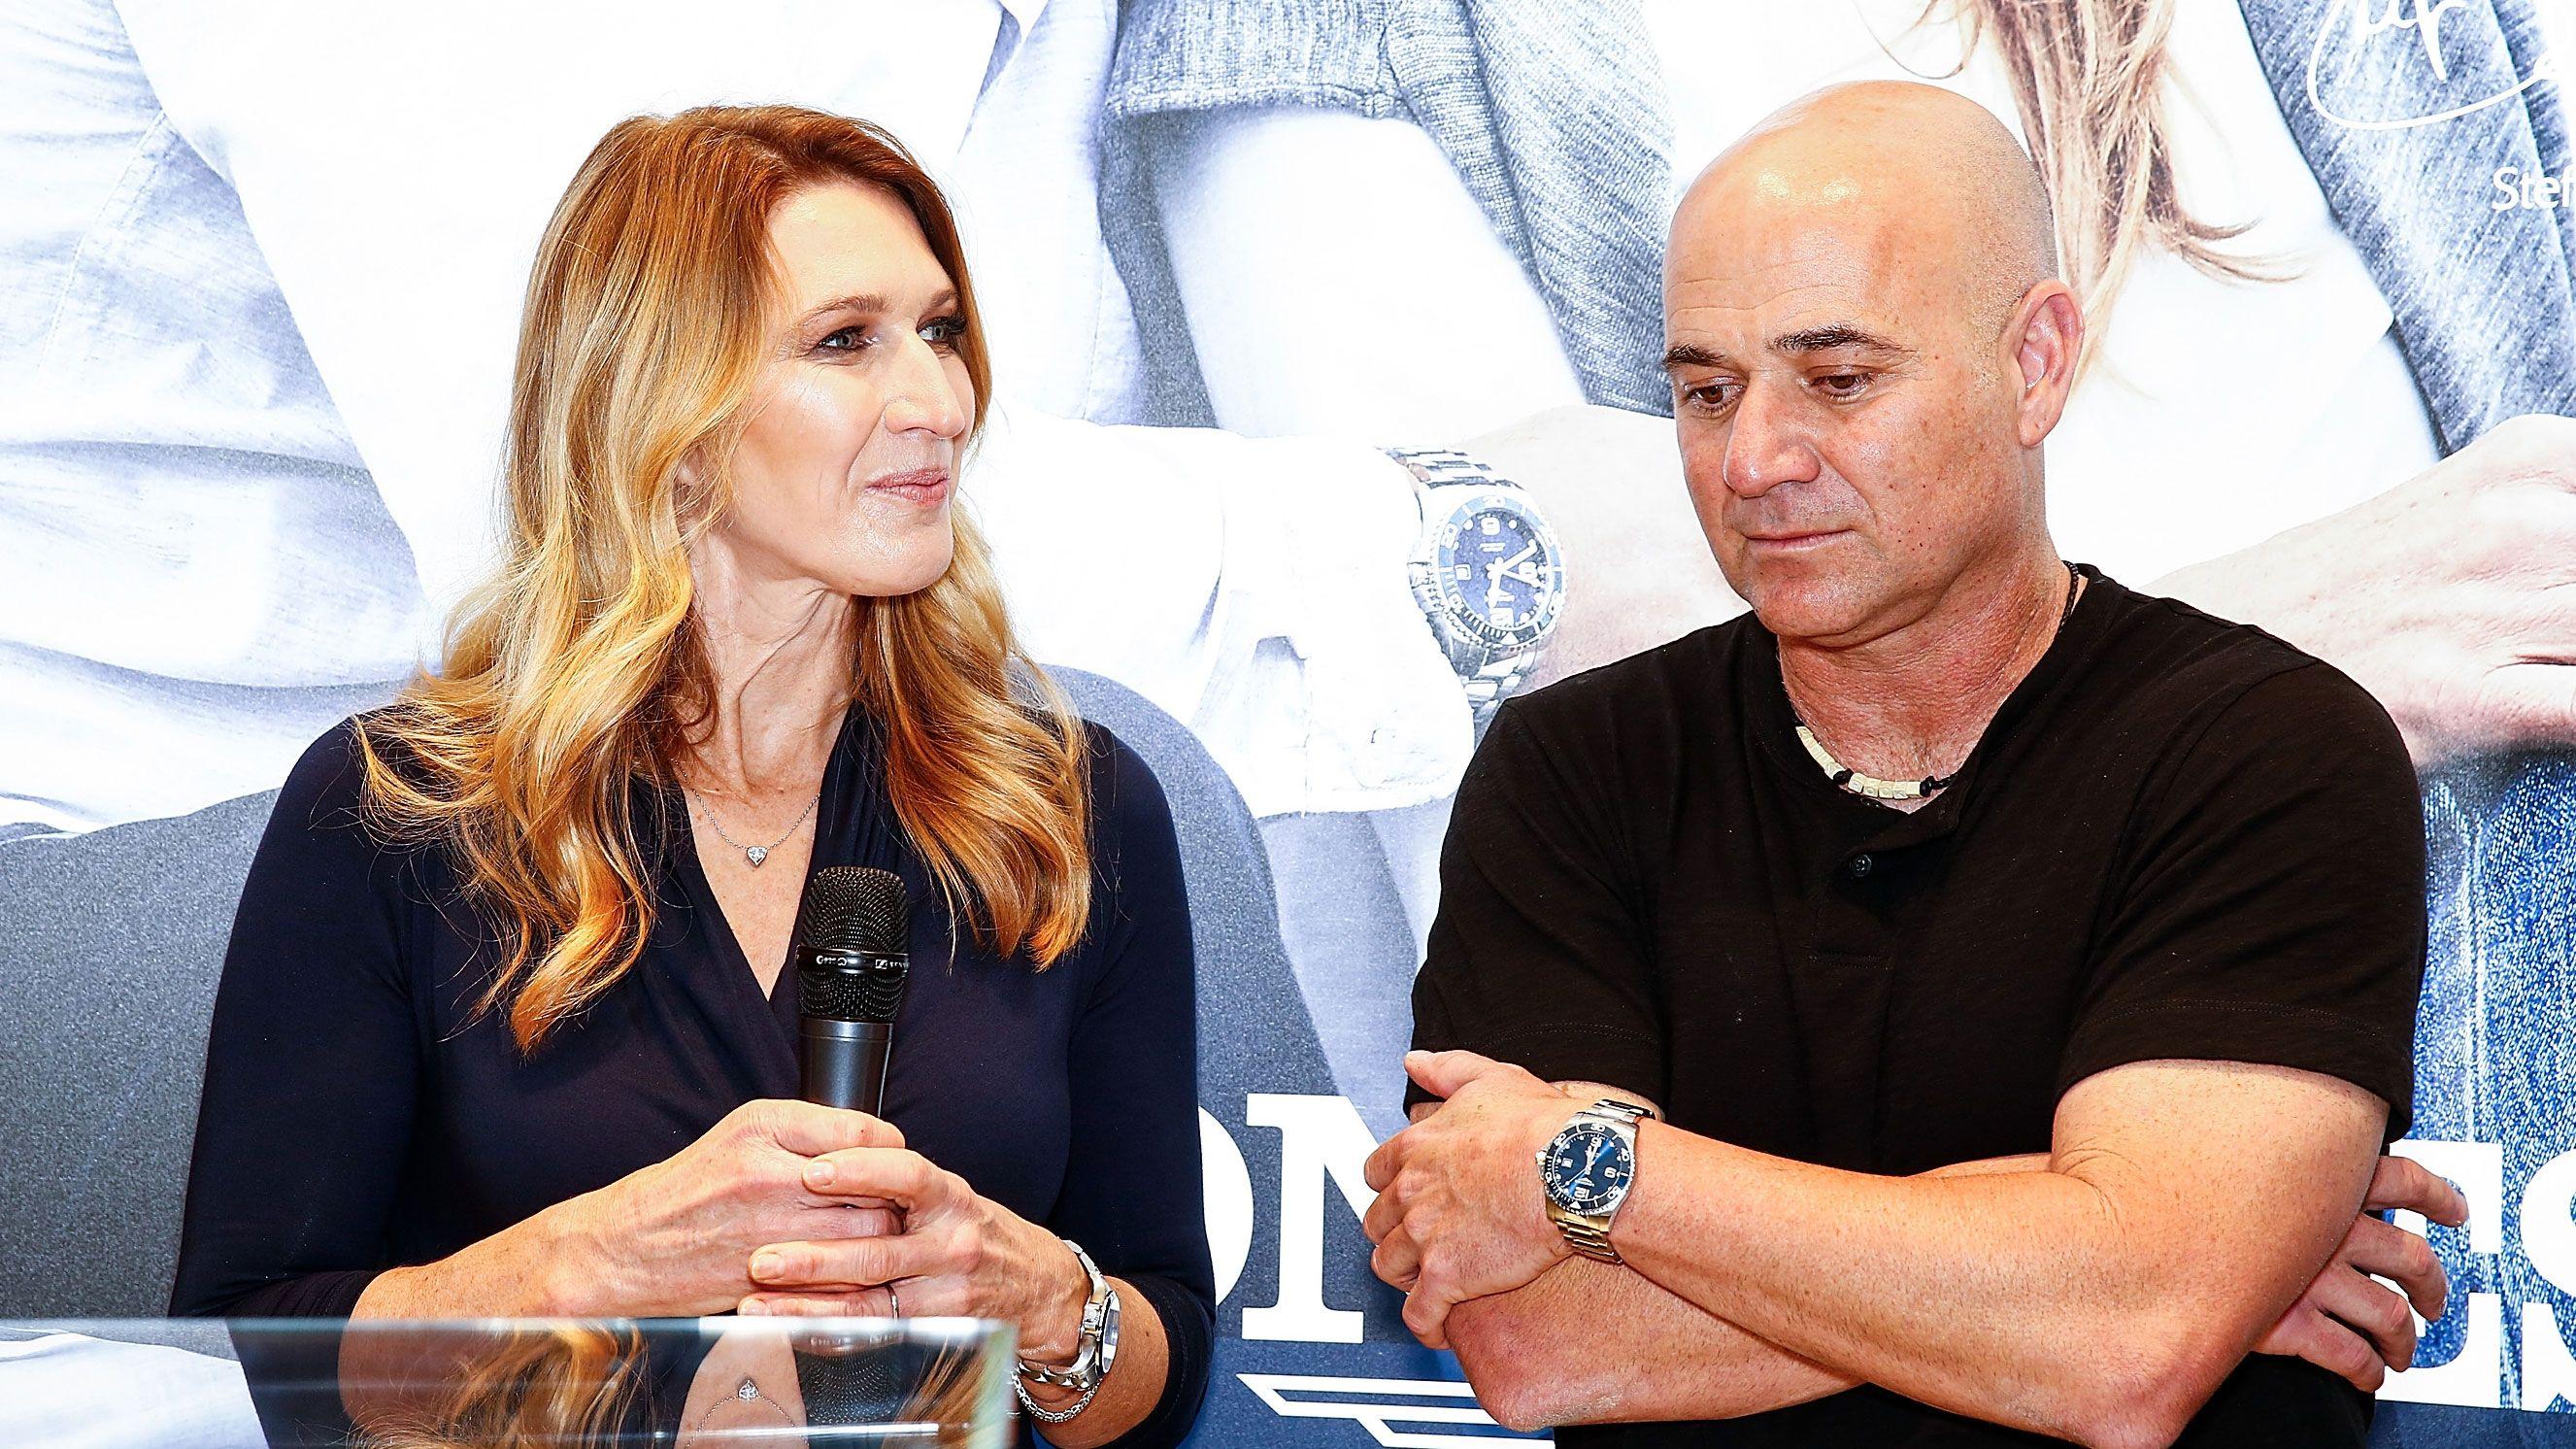 Steffi Graf Andre Agassi Ehe Probleme Jetzt Kommt Alles Heraus Steffi Graf Andre Agassi Promi News